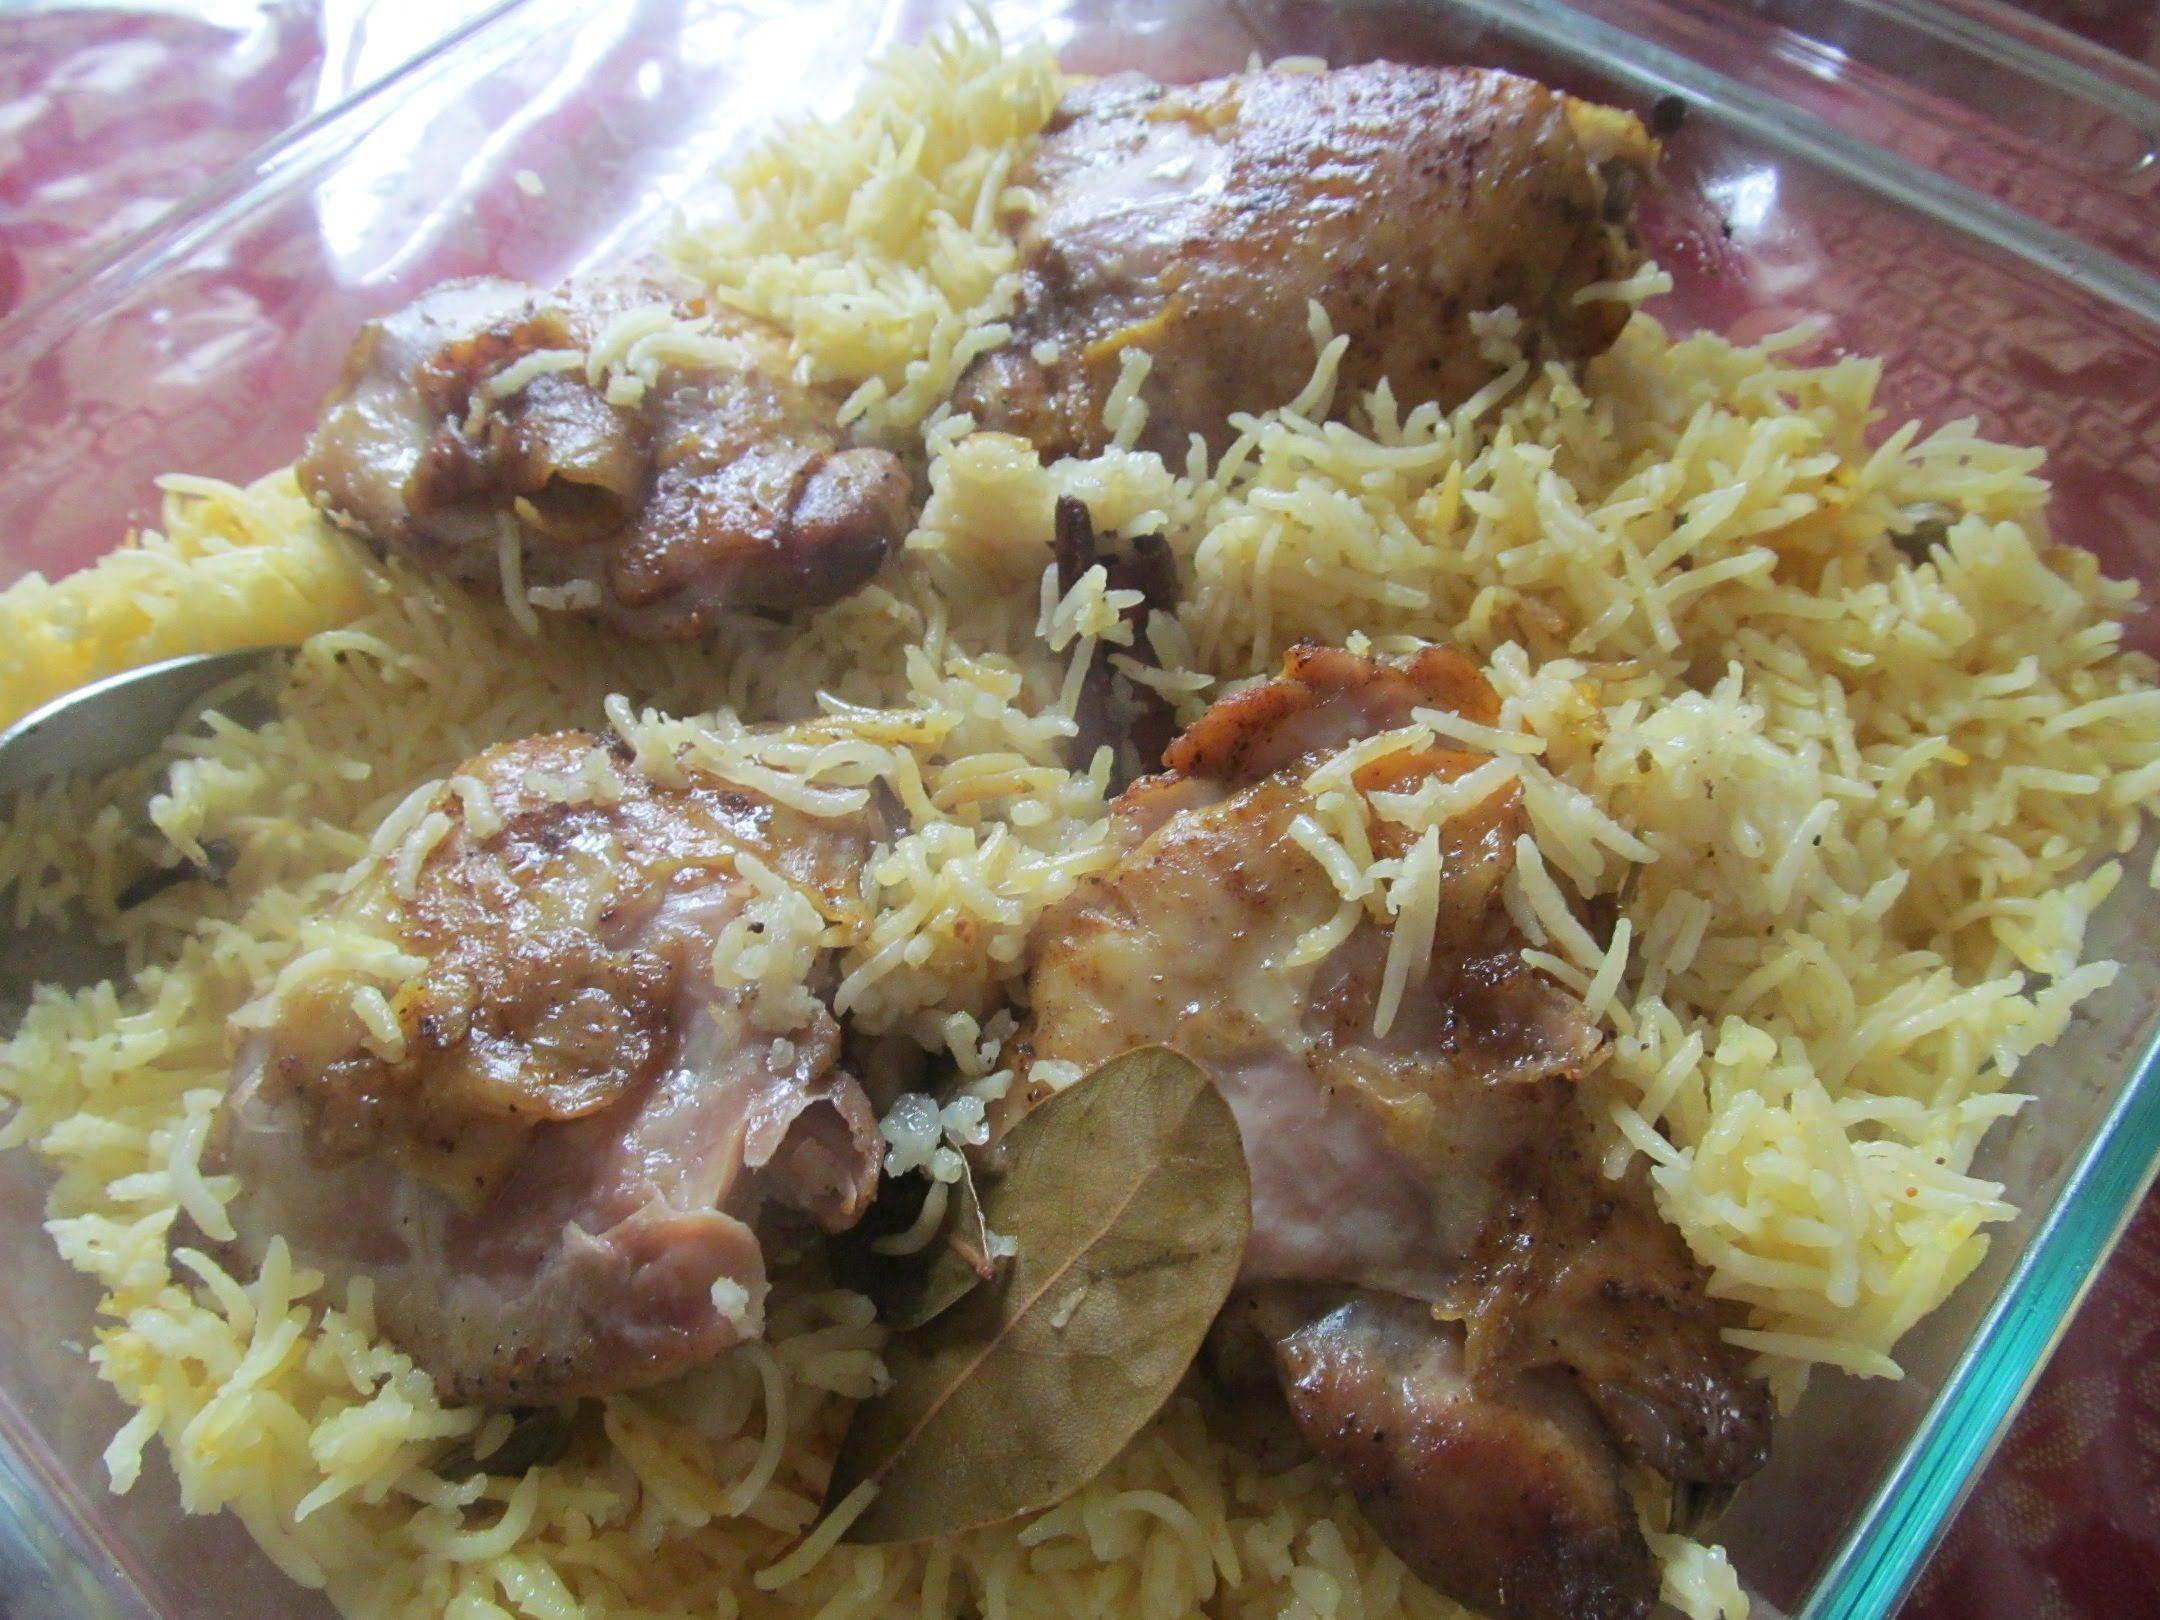 وصفة رقم ٩٤ طريقة عمل رز ودجاج بالفرن Food Cooking Beef